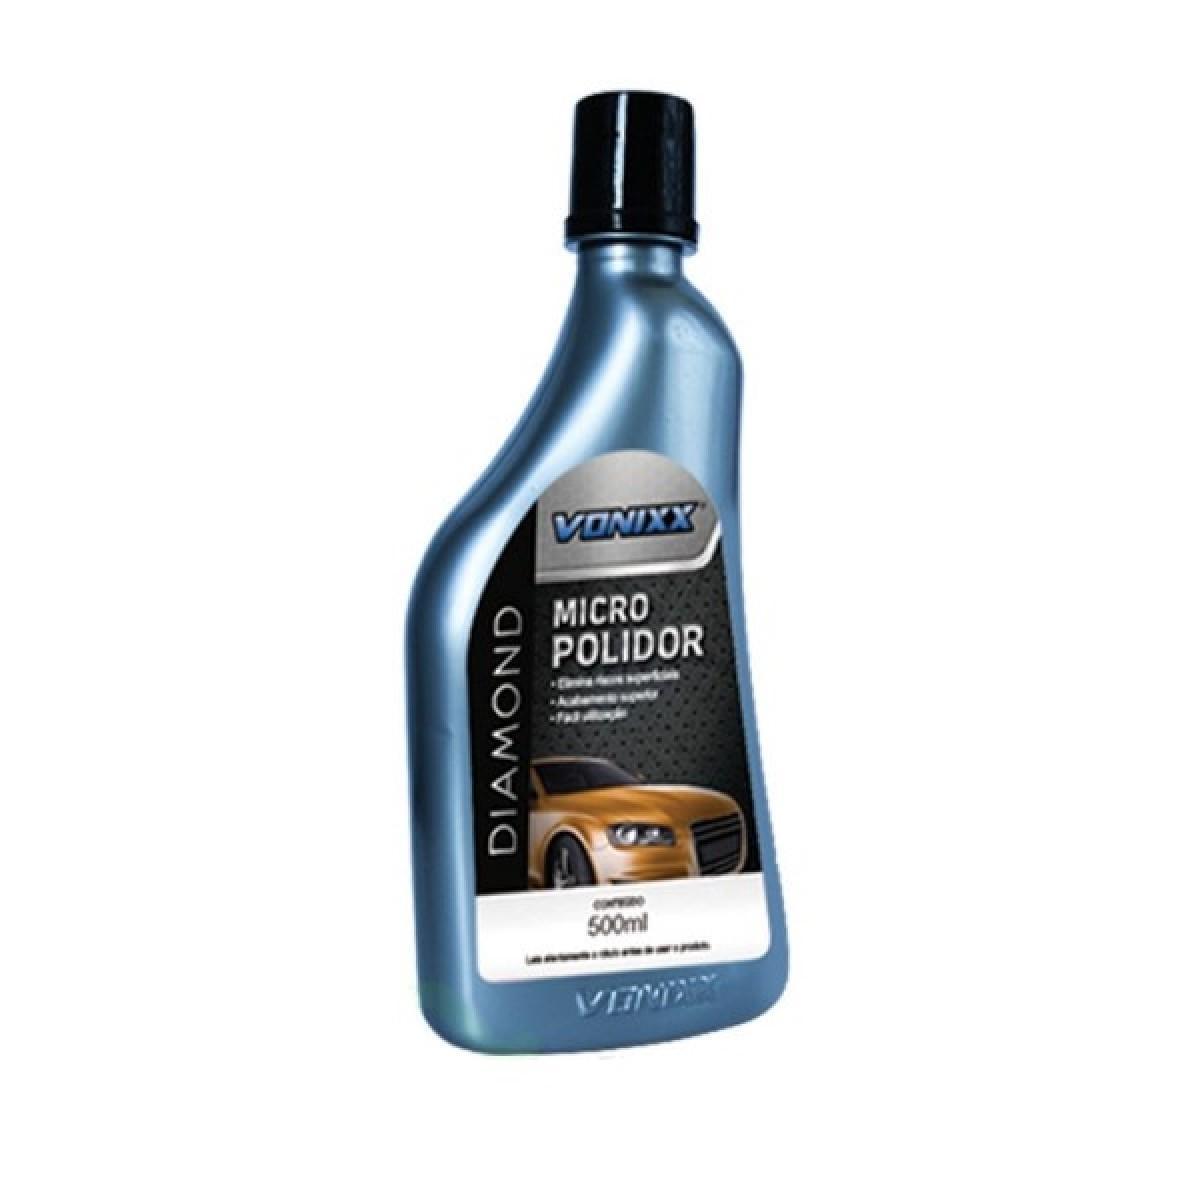 Vonixx Diamond Micro Polidor - 500ml  - Loja Go Eco Wash